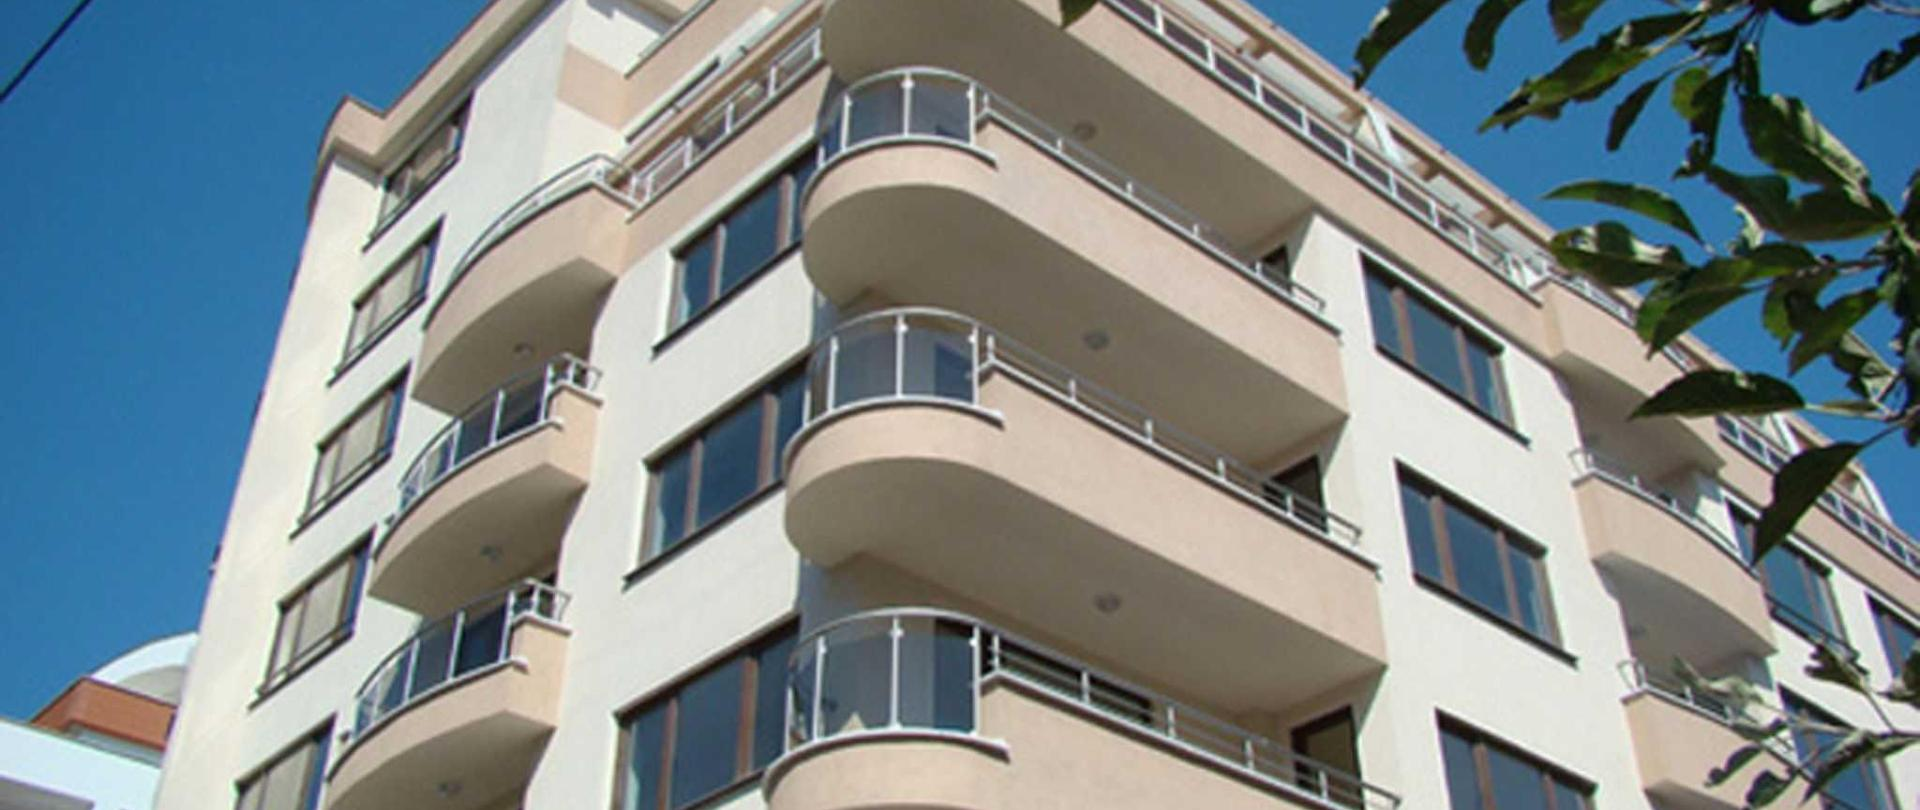 hotel_apartment_building.jpg